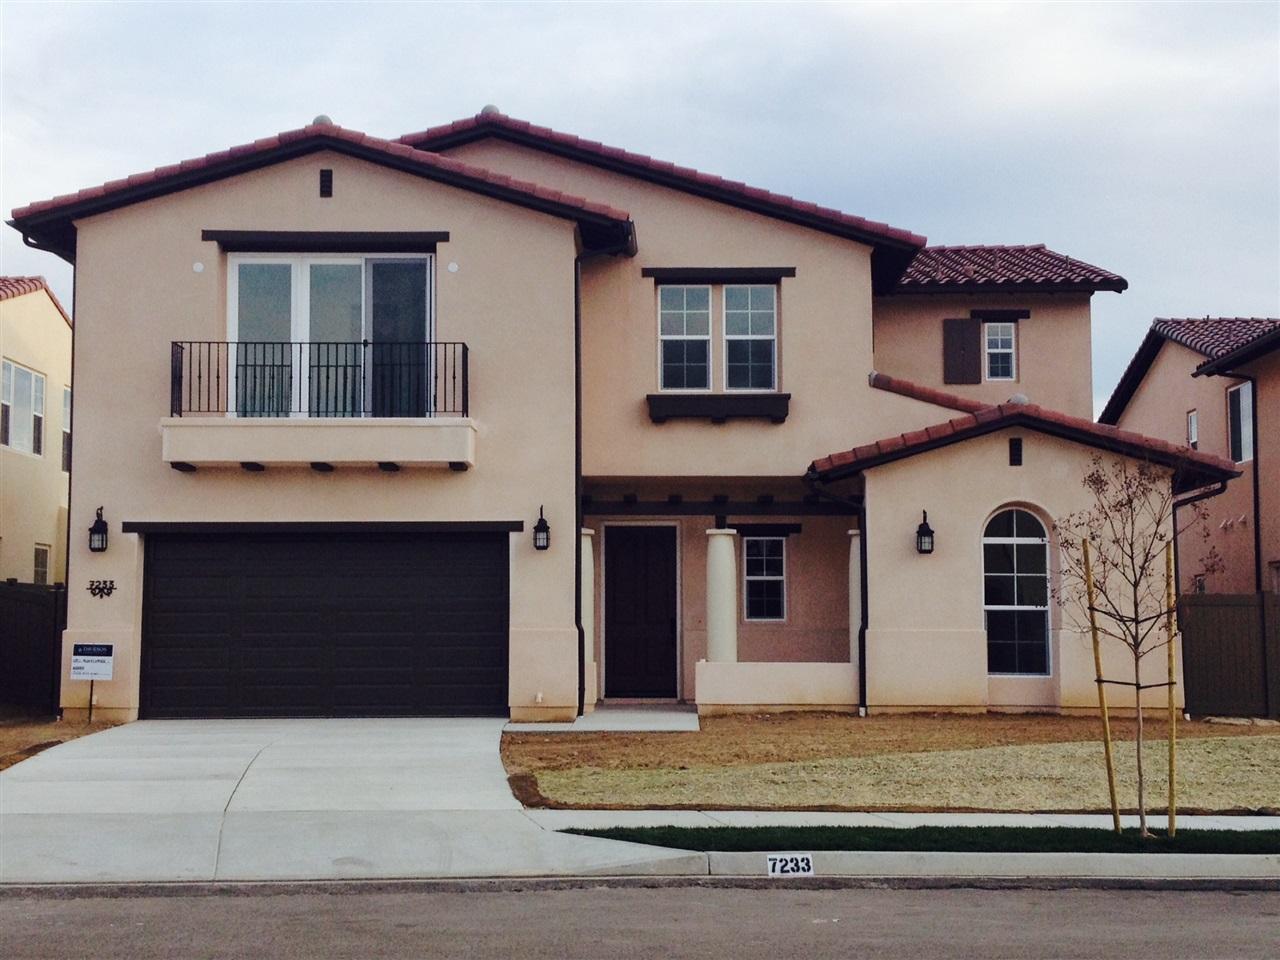 7233 Sitio Lima, Carlsbad, CA